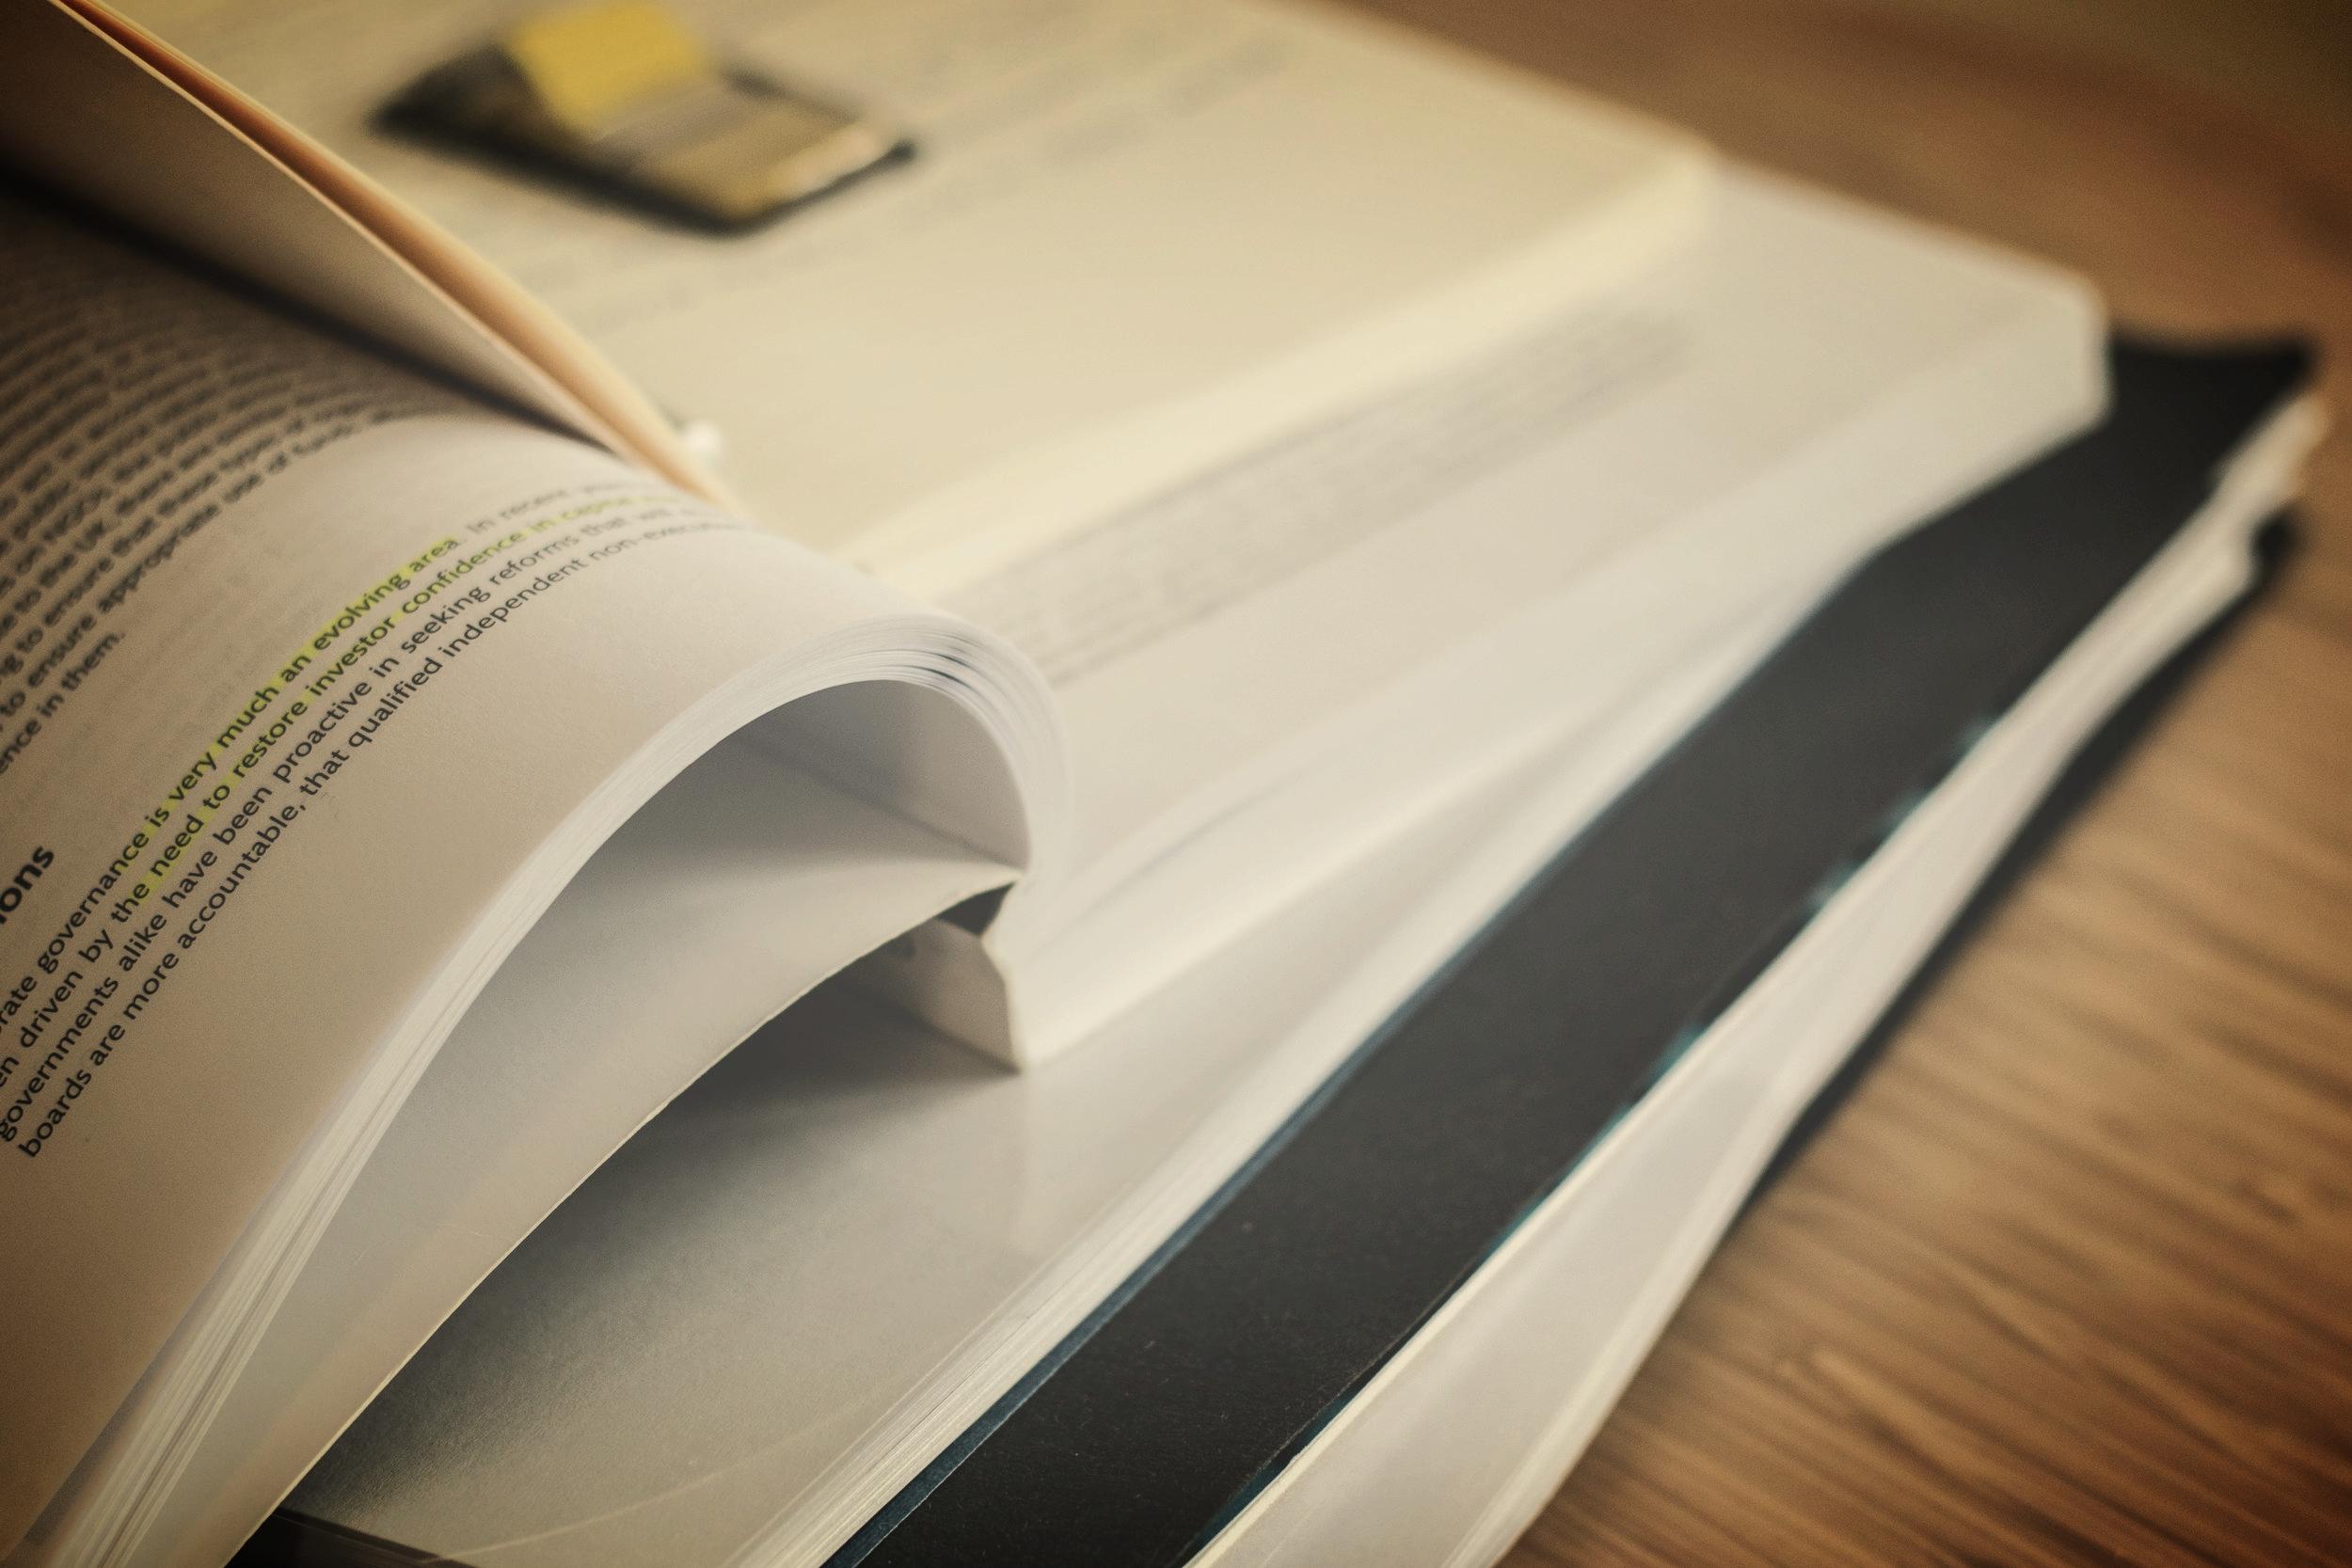 books-pexels-photo-327882.jpeg